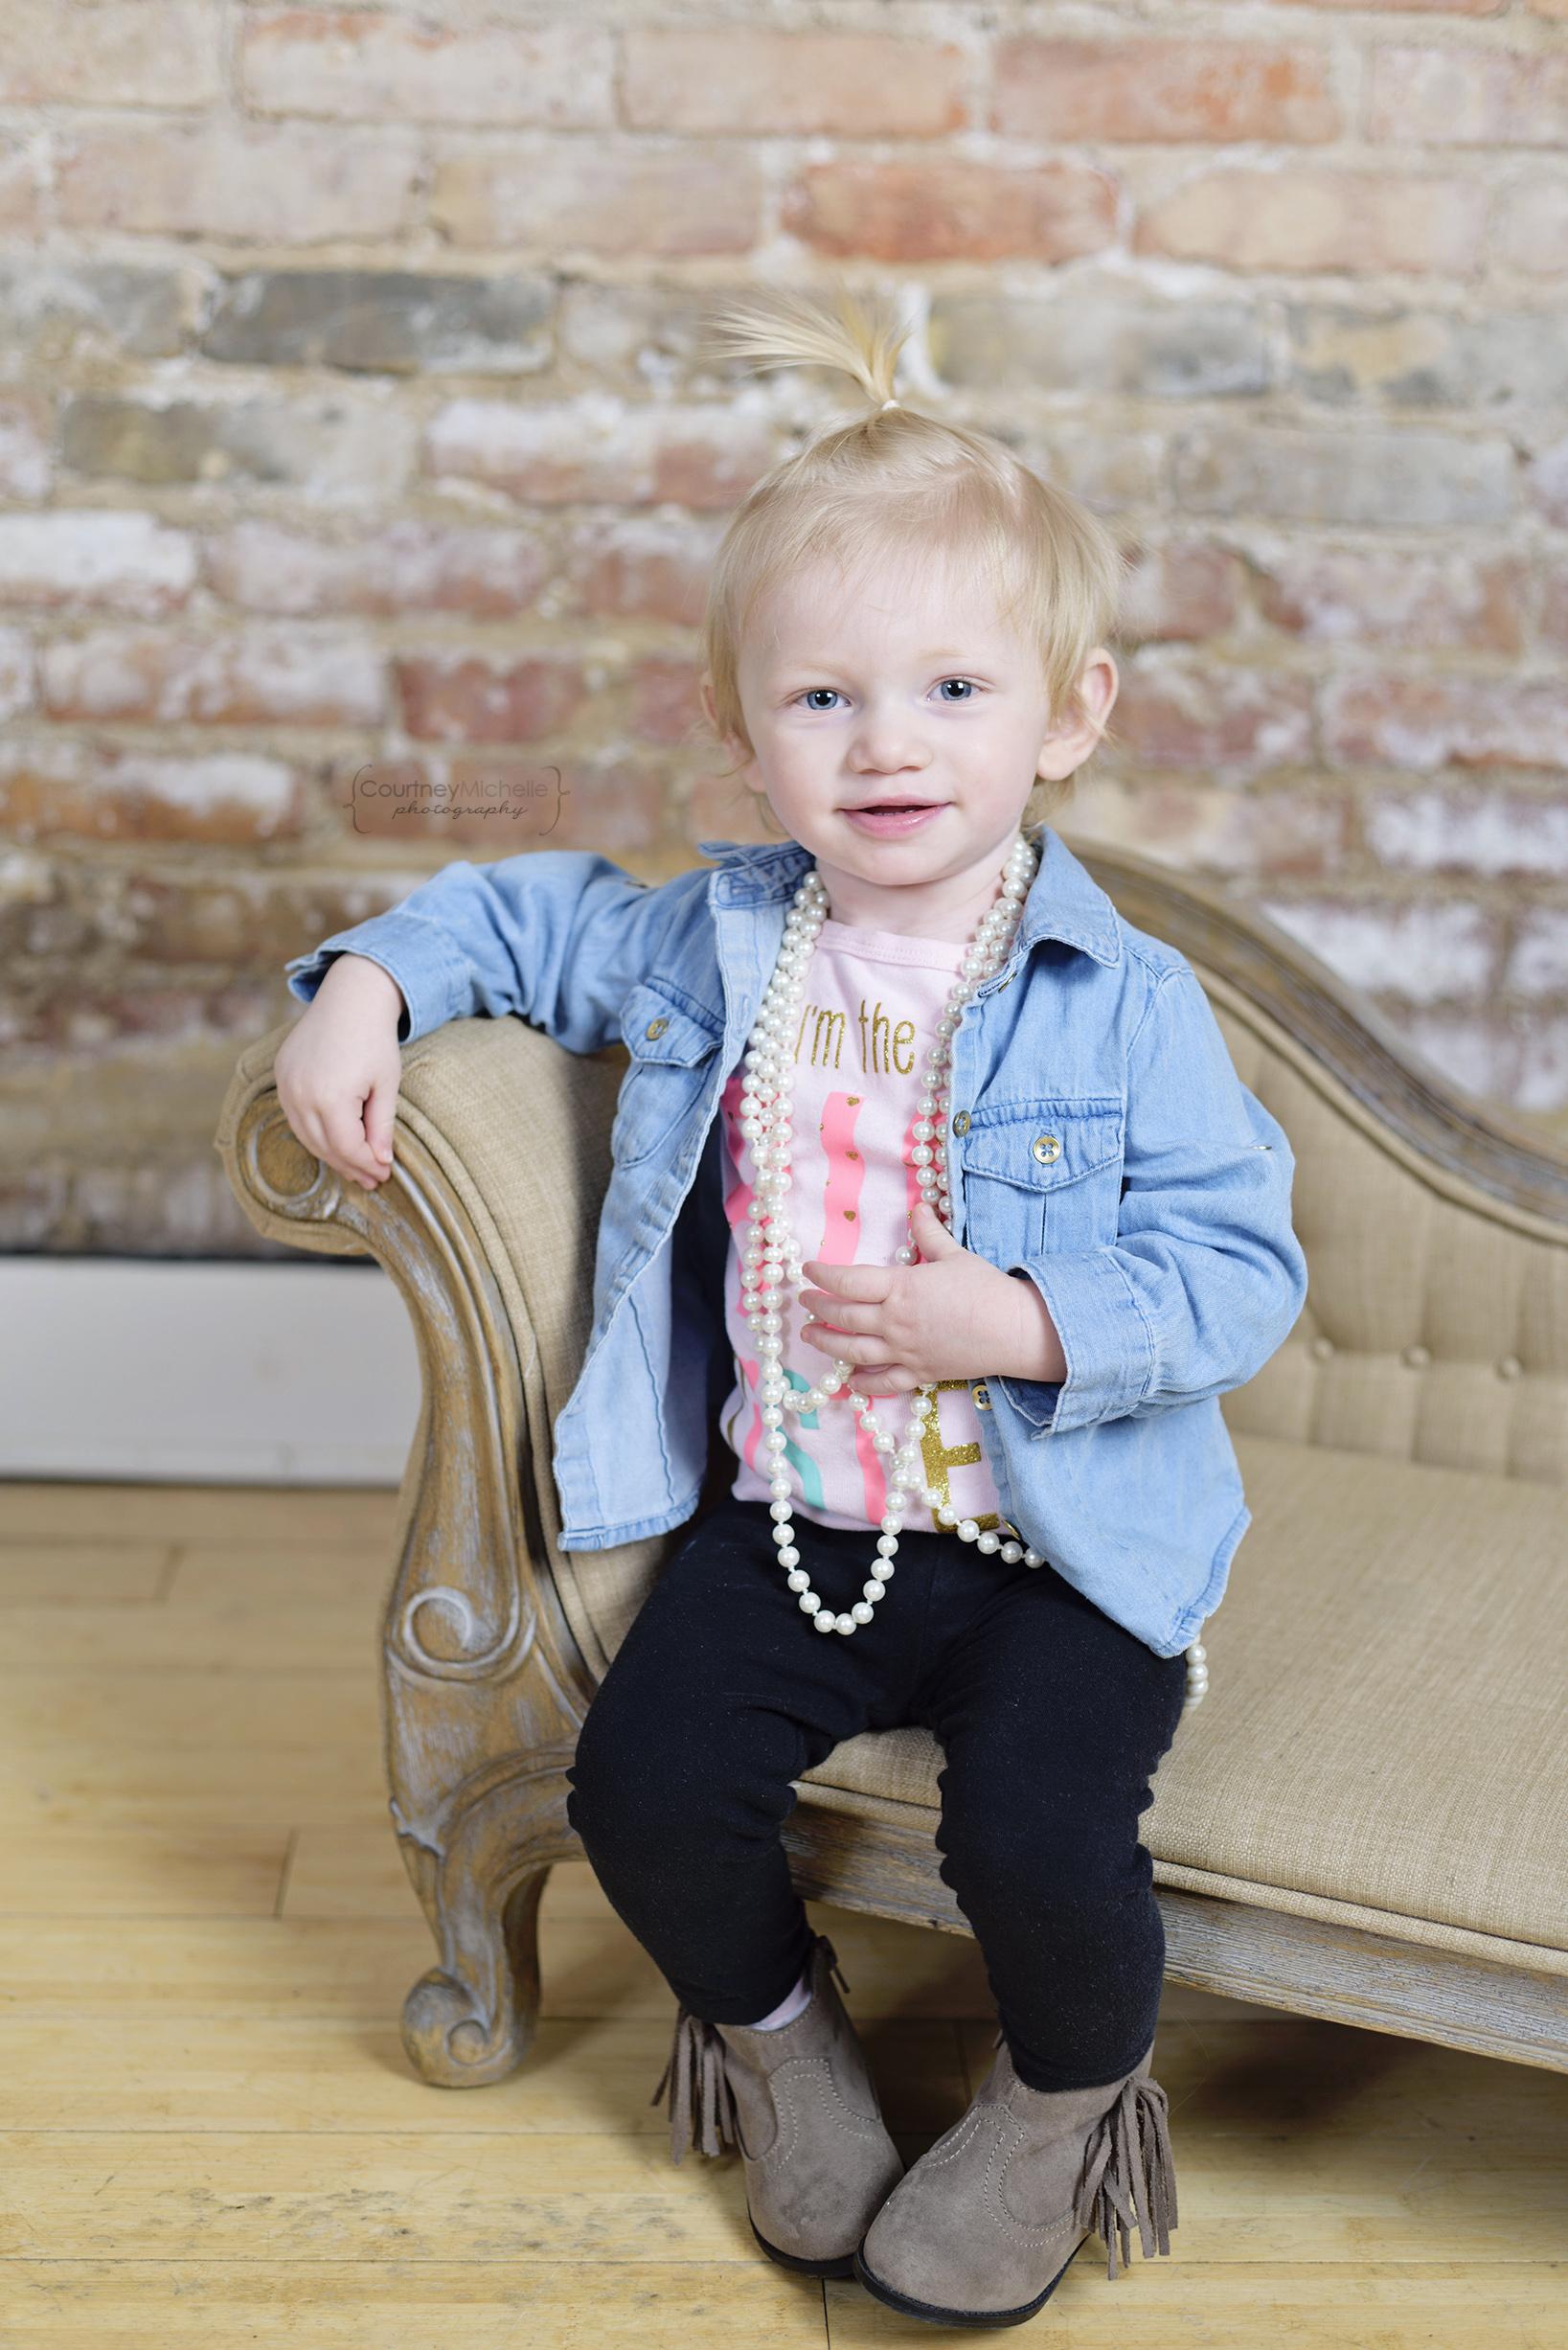 chicago-newborn-photographer-big-sister-on-couch©COPYRIGHTCMP-5065edit.jpg